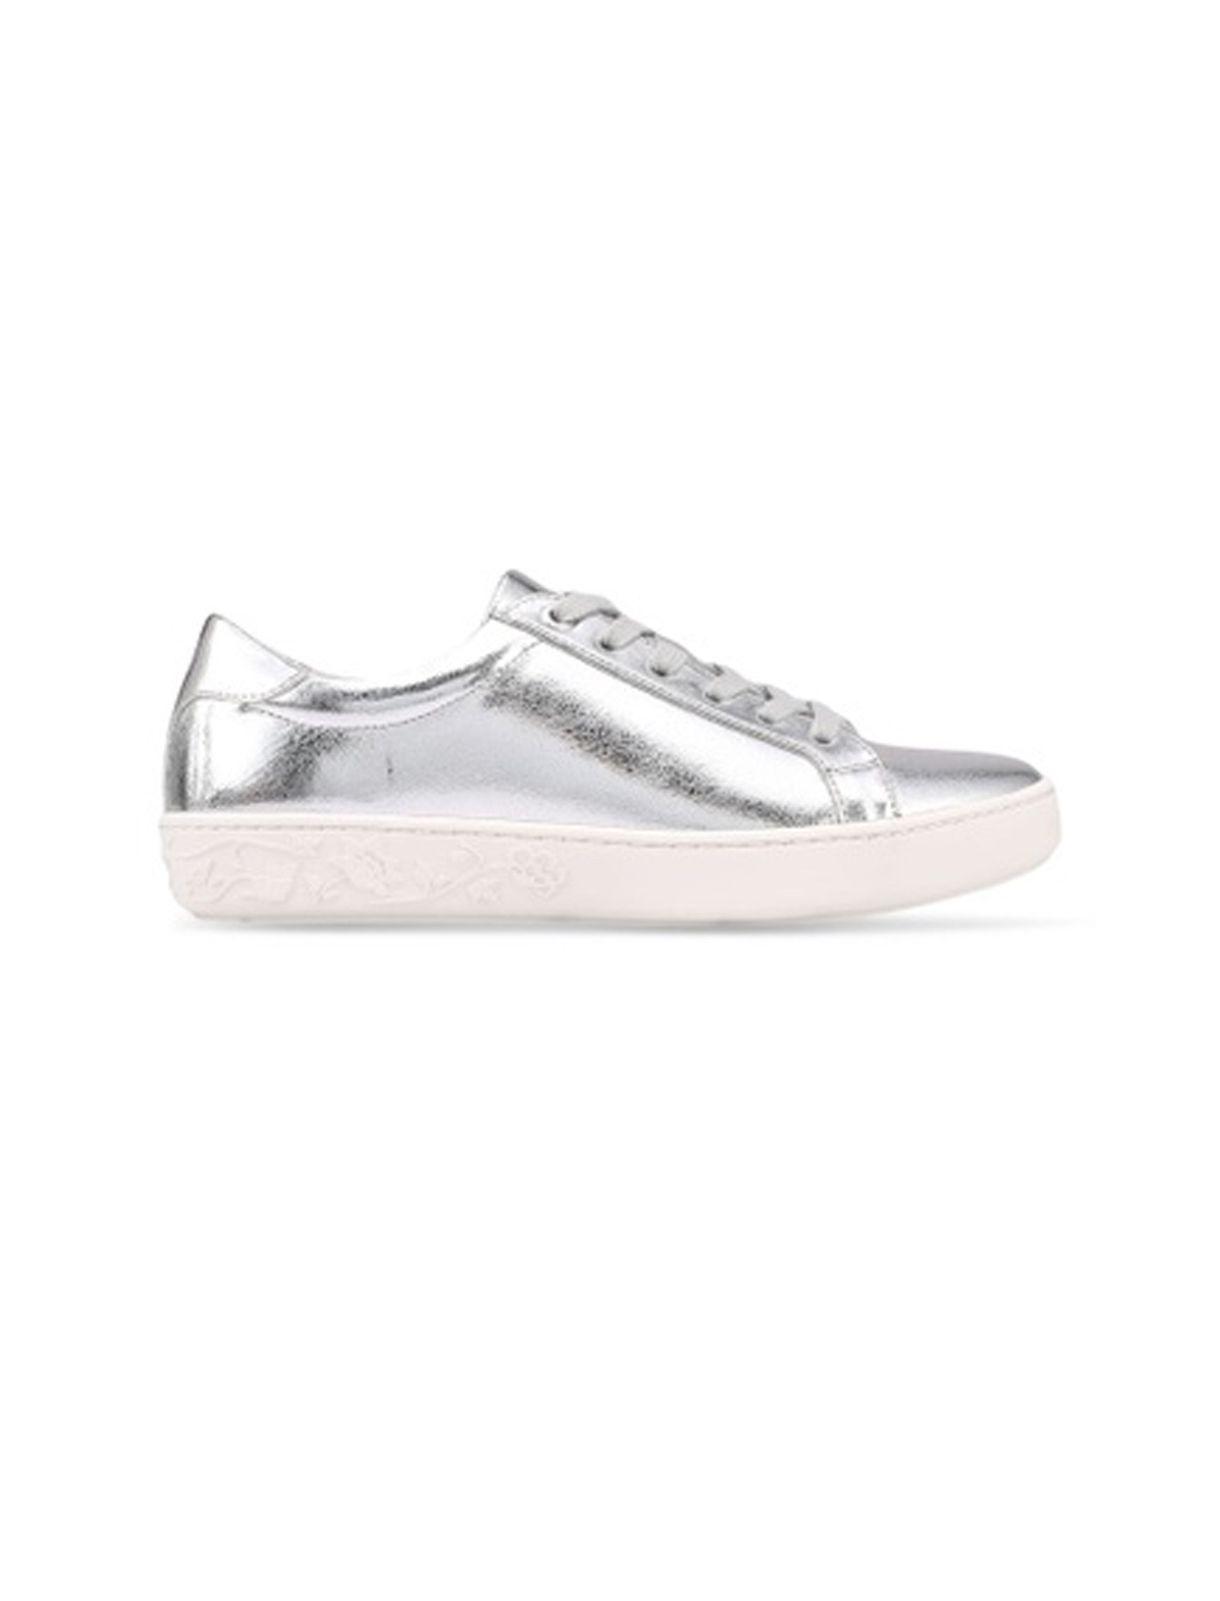 کتانی بندی زنانه – آلدو  Women Lace-Up Sneakers – Aldo